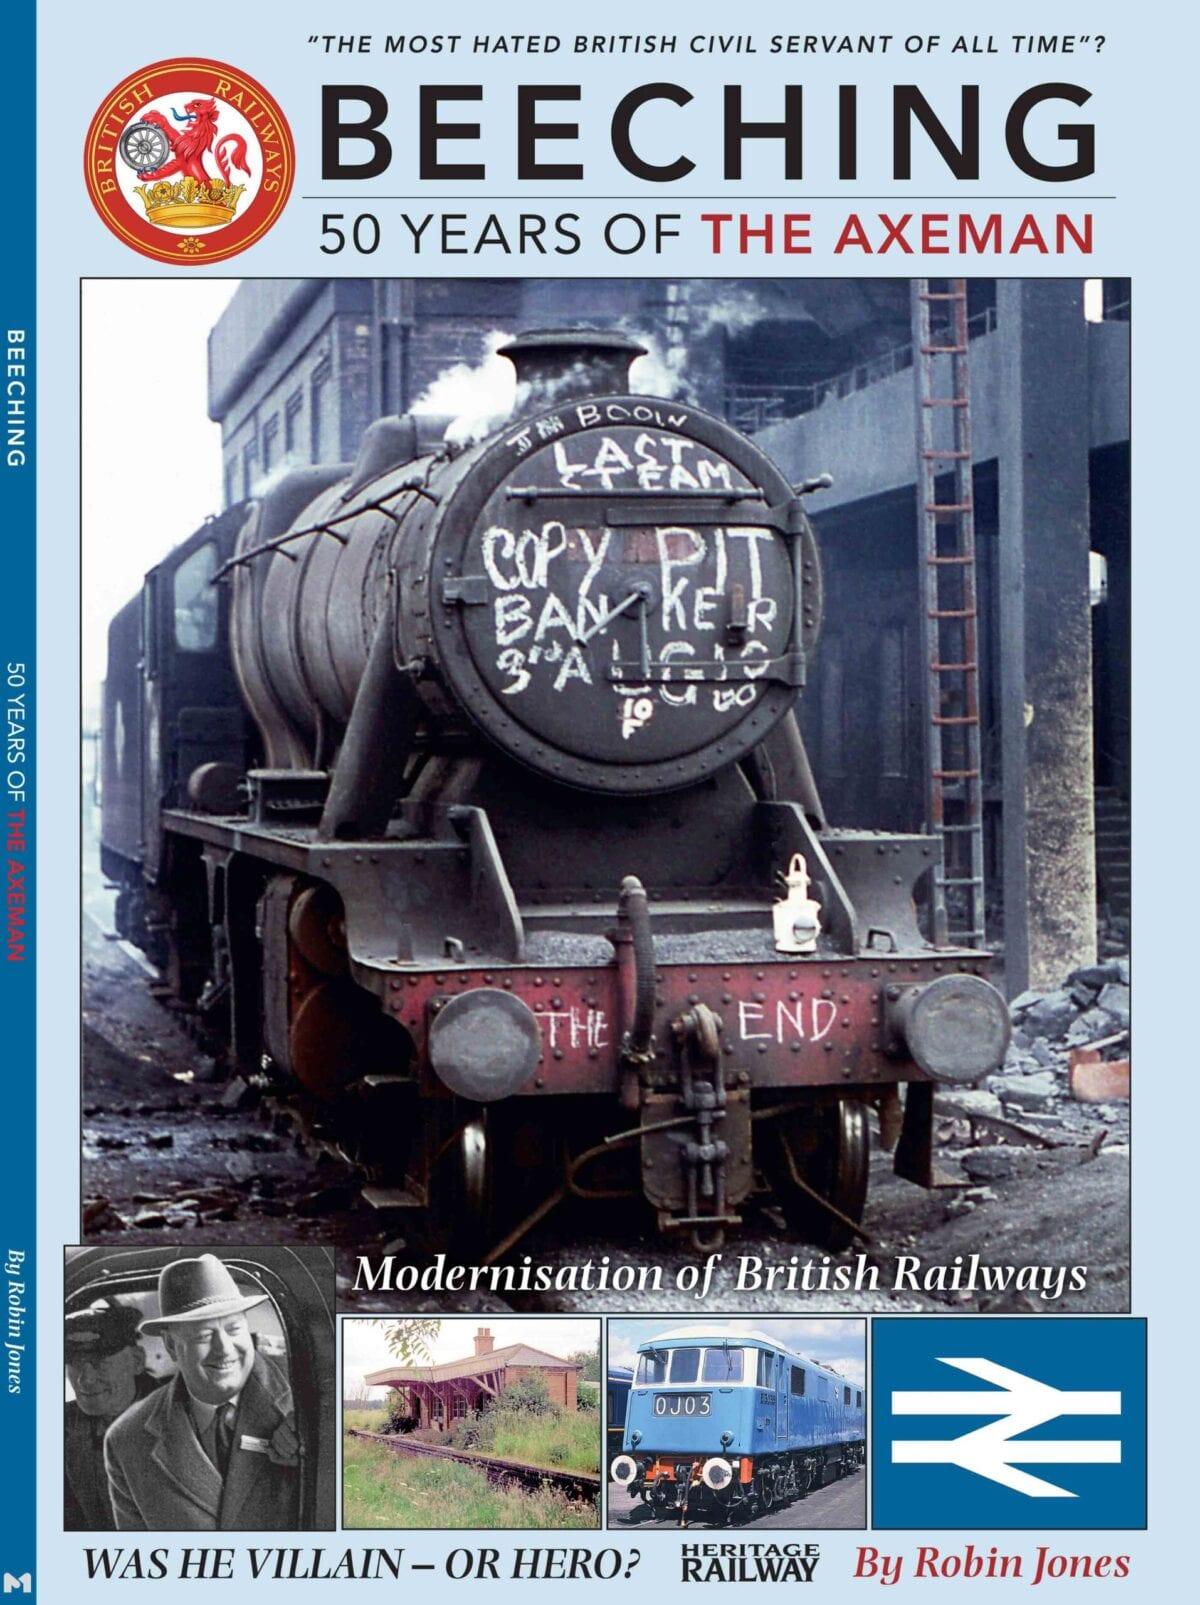 Beeching - 50 Years of the Axeman